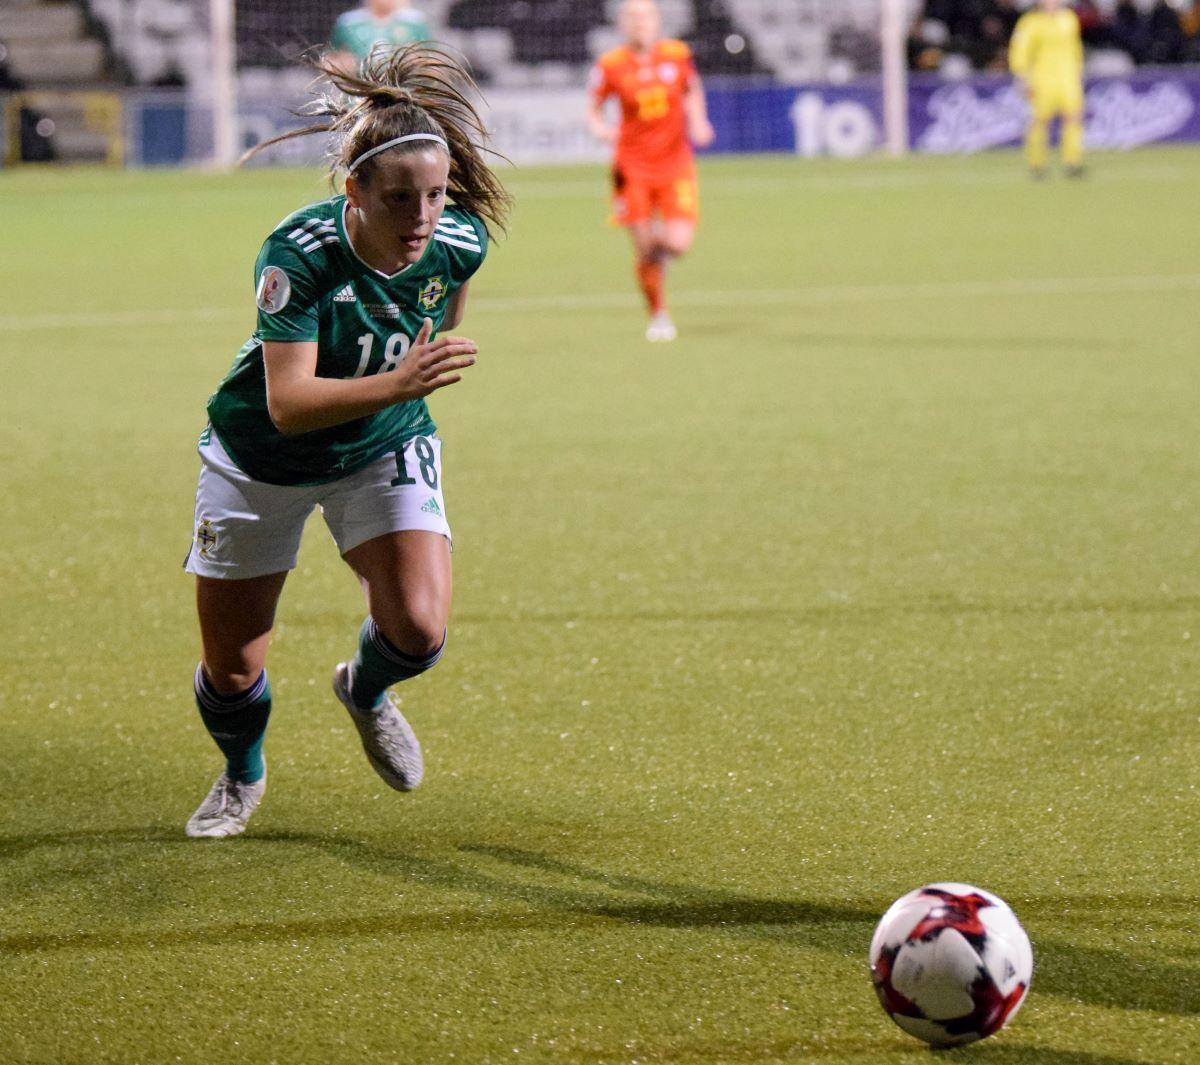 Northern Ireland's Megan Bell